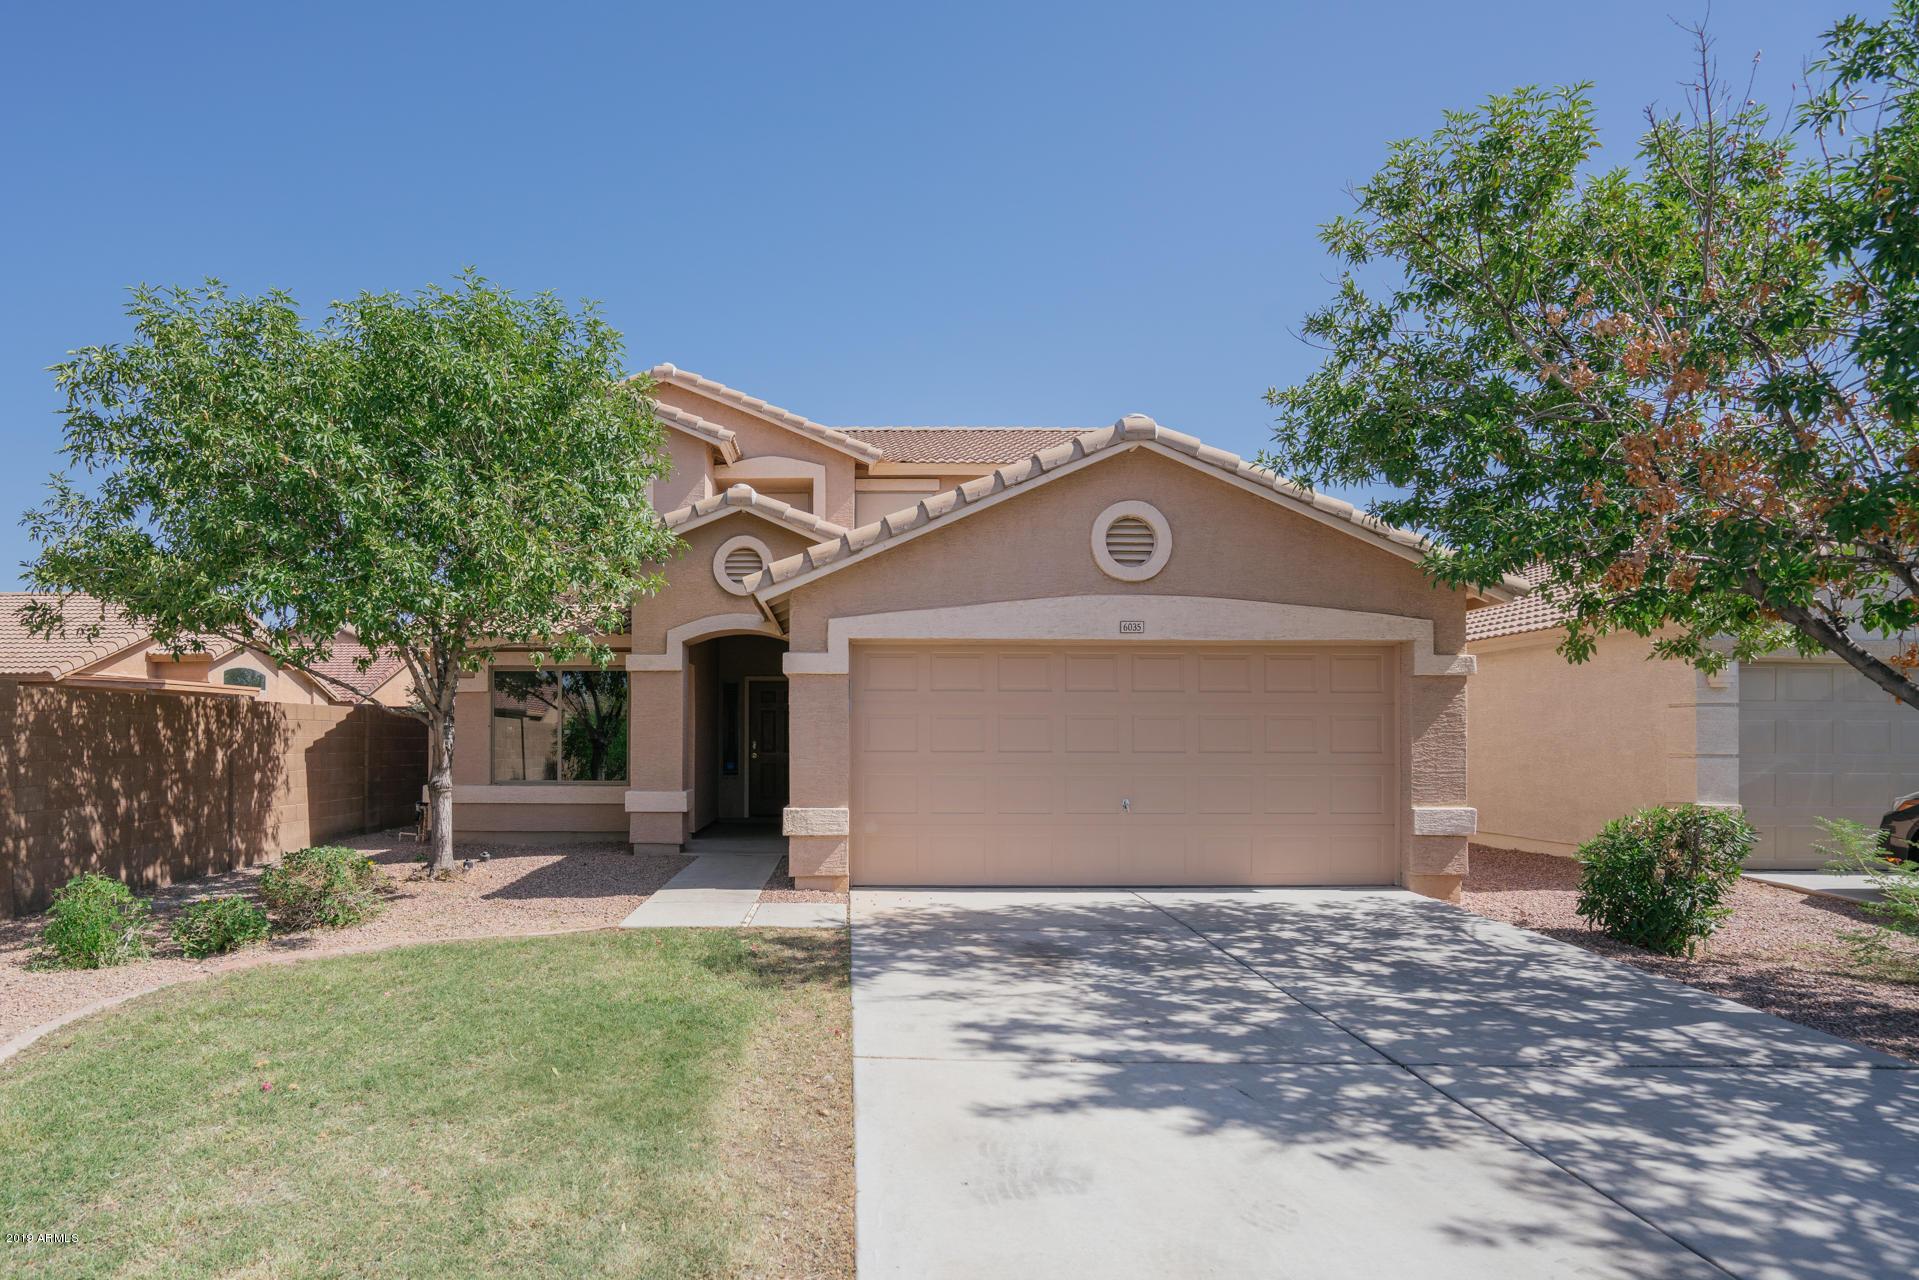 Photo of 6035 N MILANO Court, Litchfield Park, AZ 85340